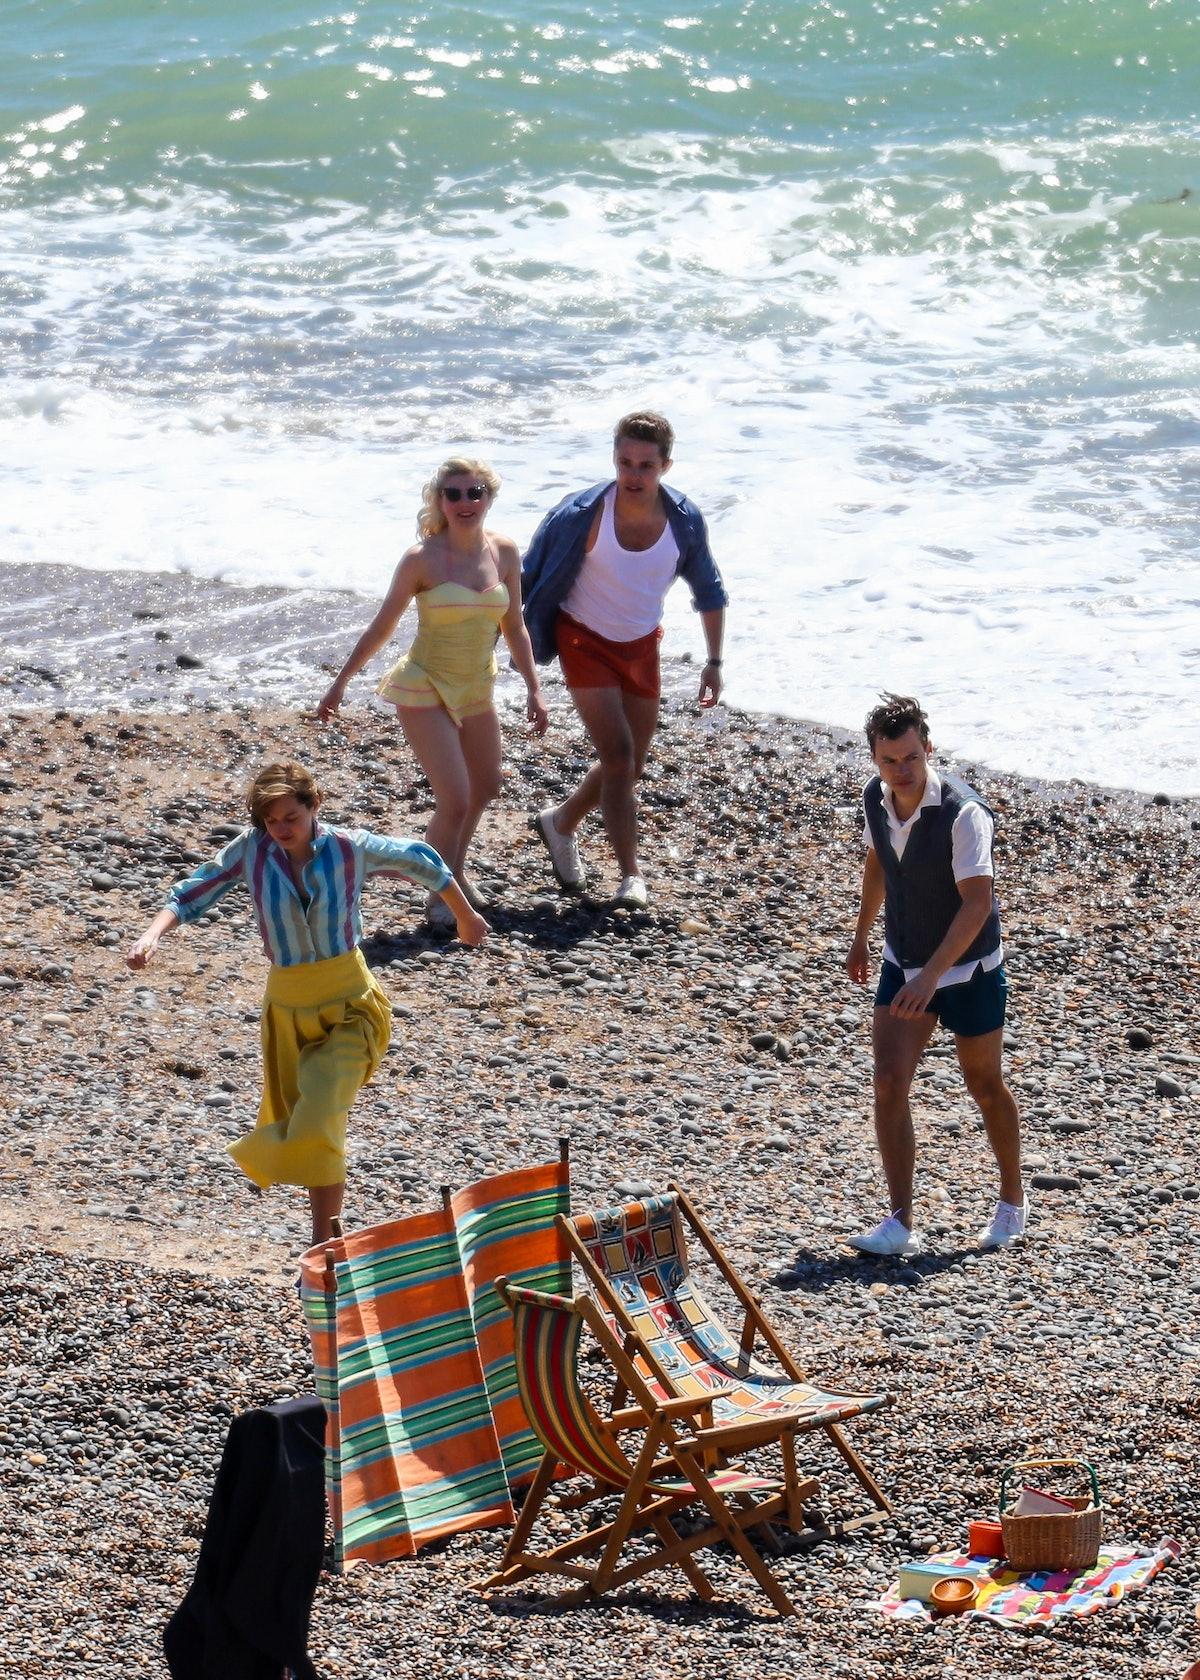 Harry Styles and Emma Corrin on the beach